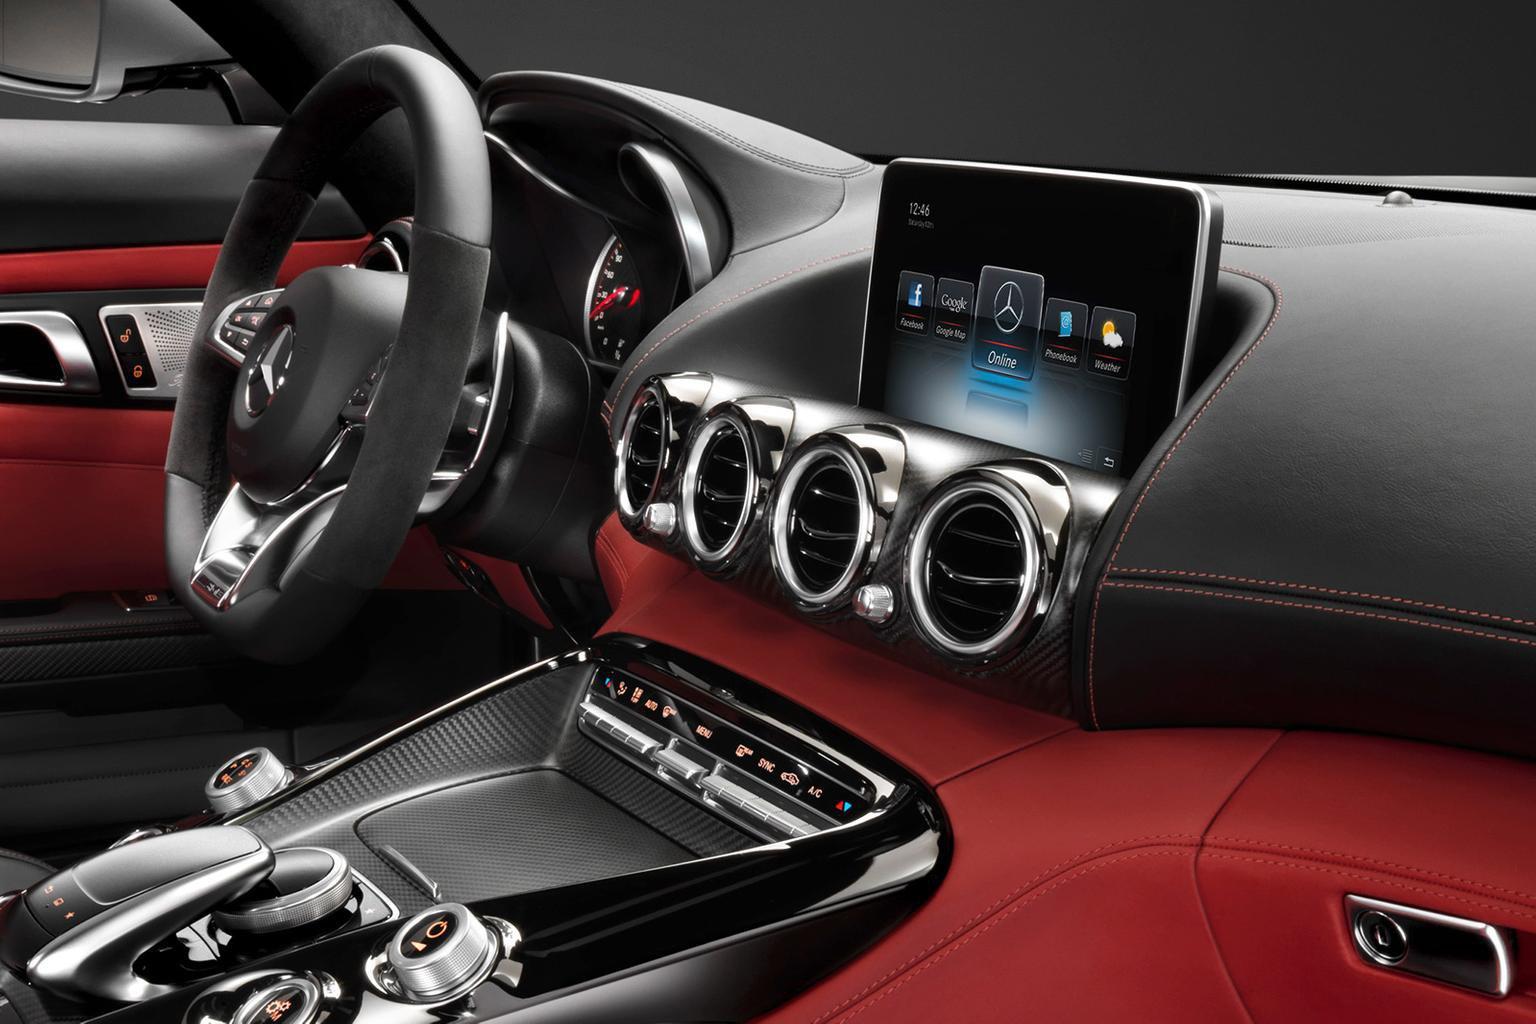 2014 Mercedes-AMG GT interior revealed